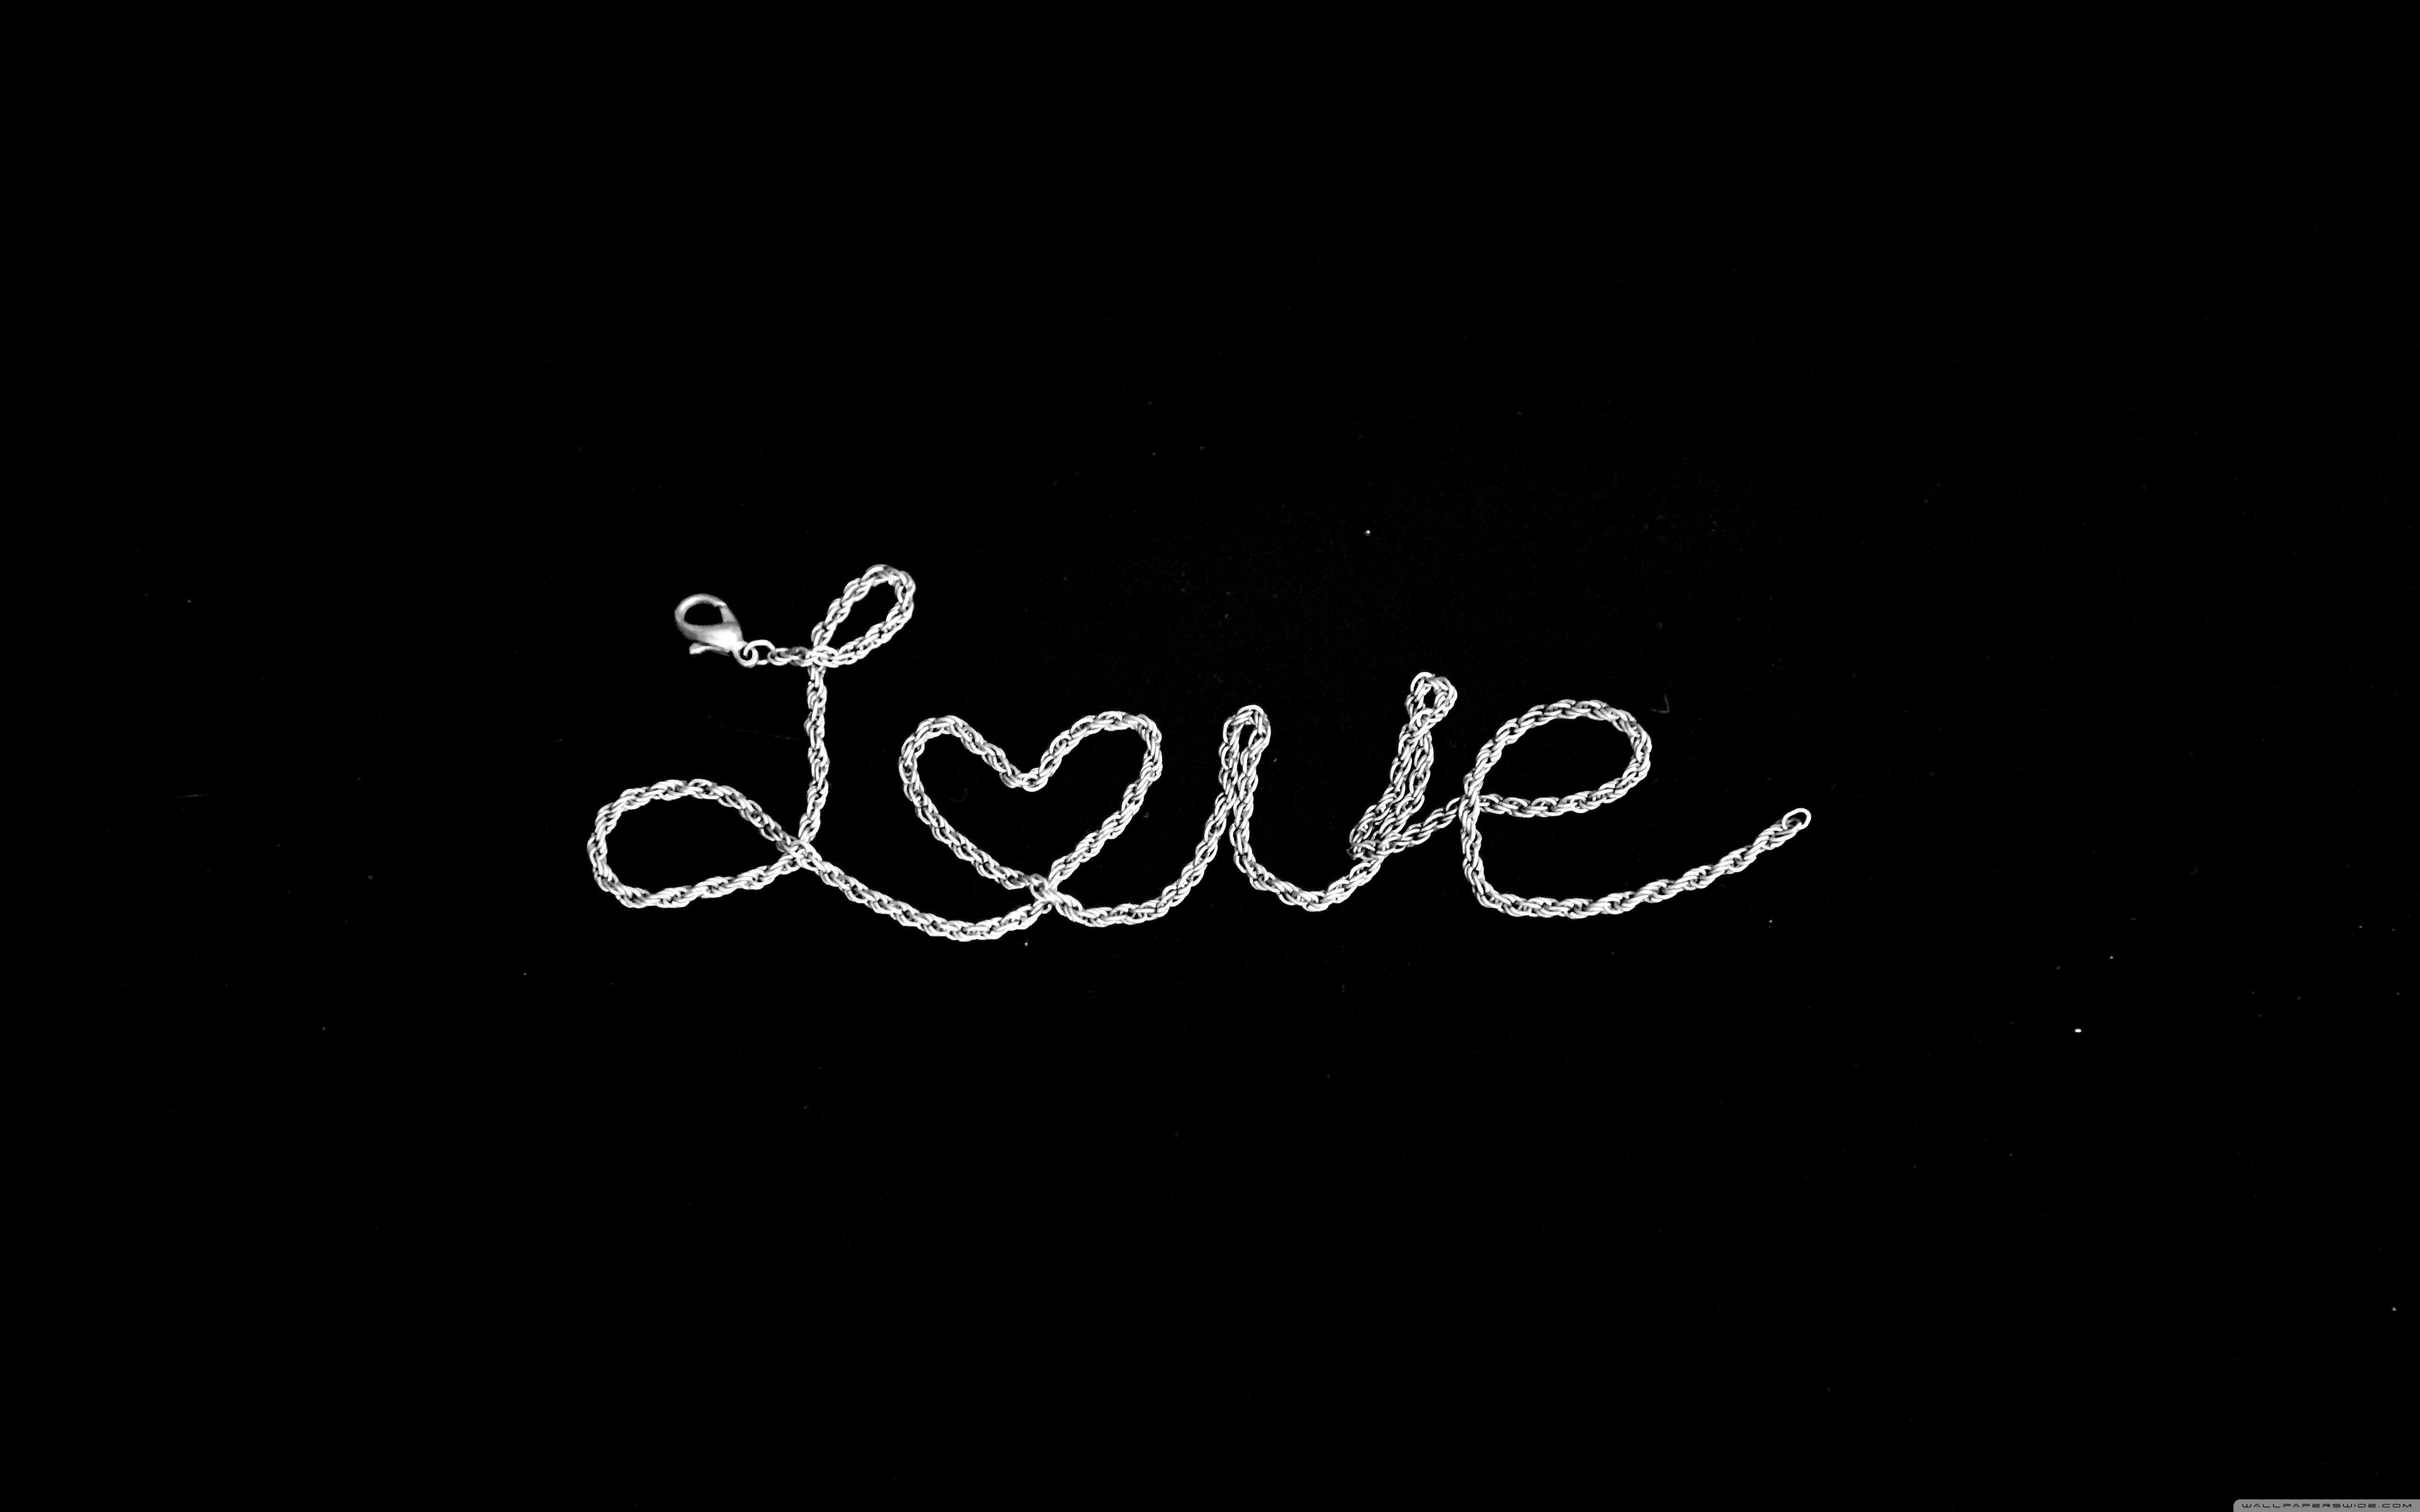 Black Love HD Wallpapers - Wallpaper Cave